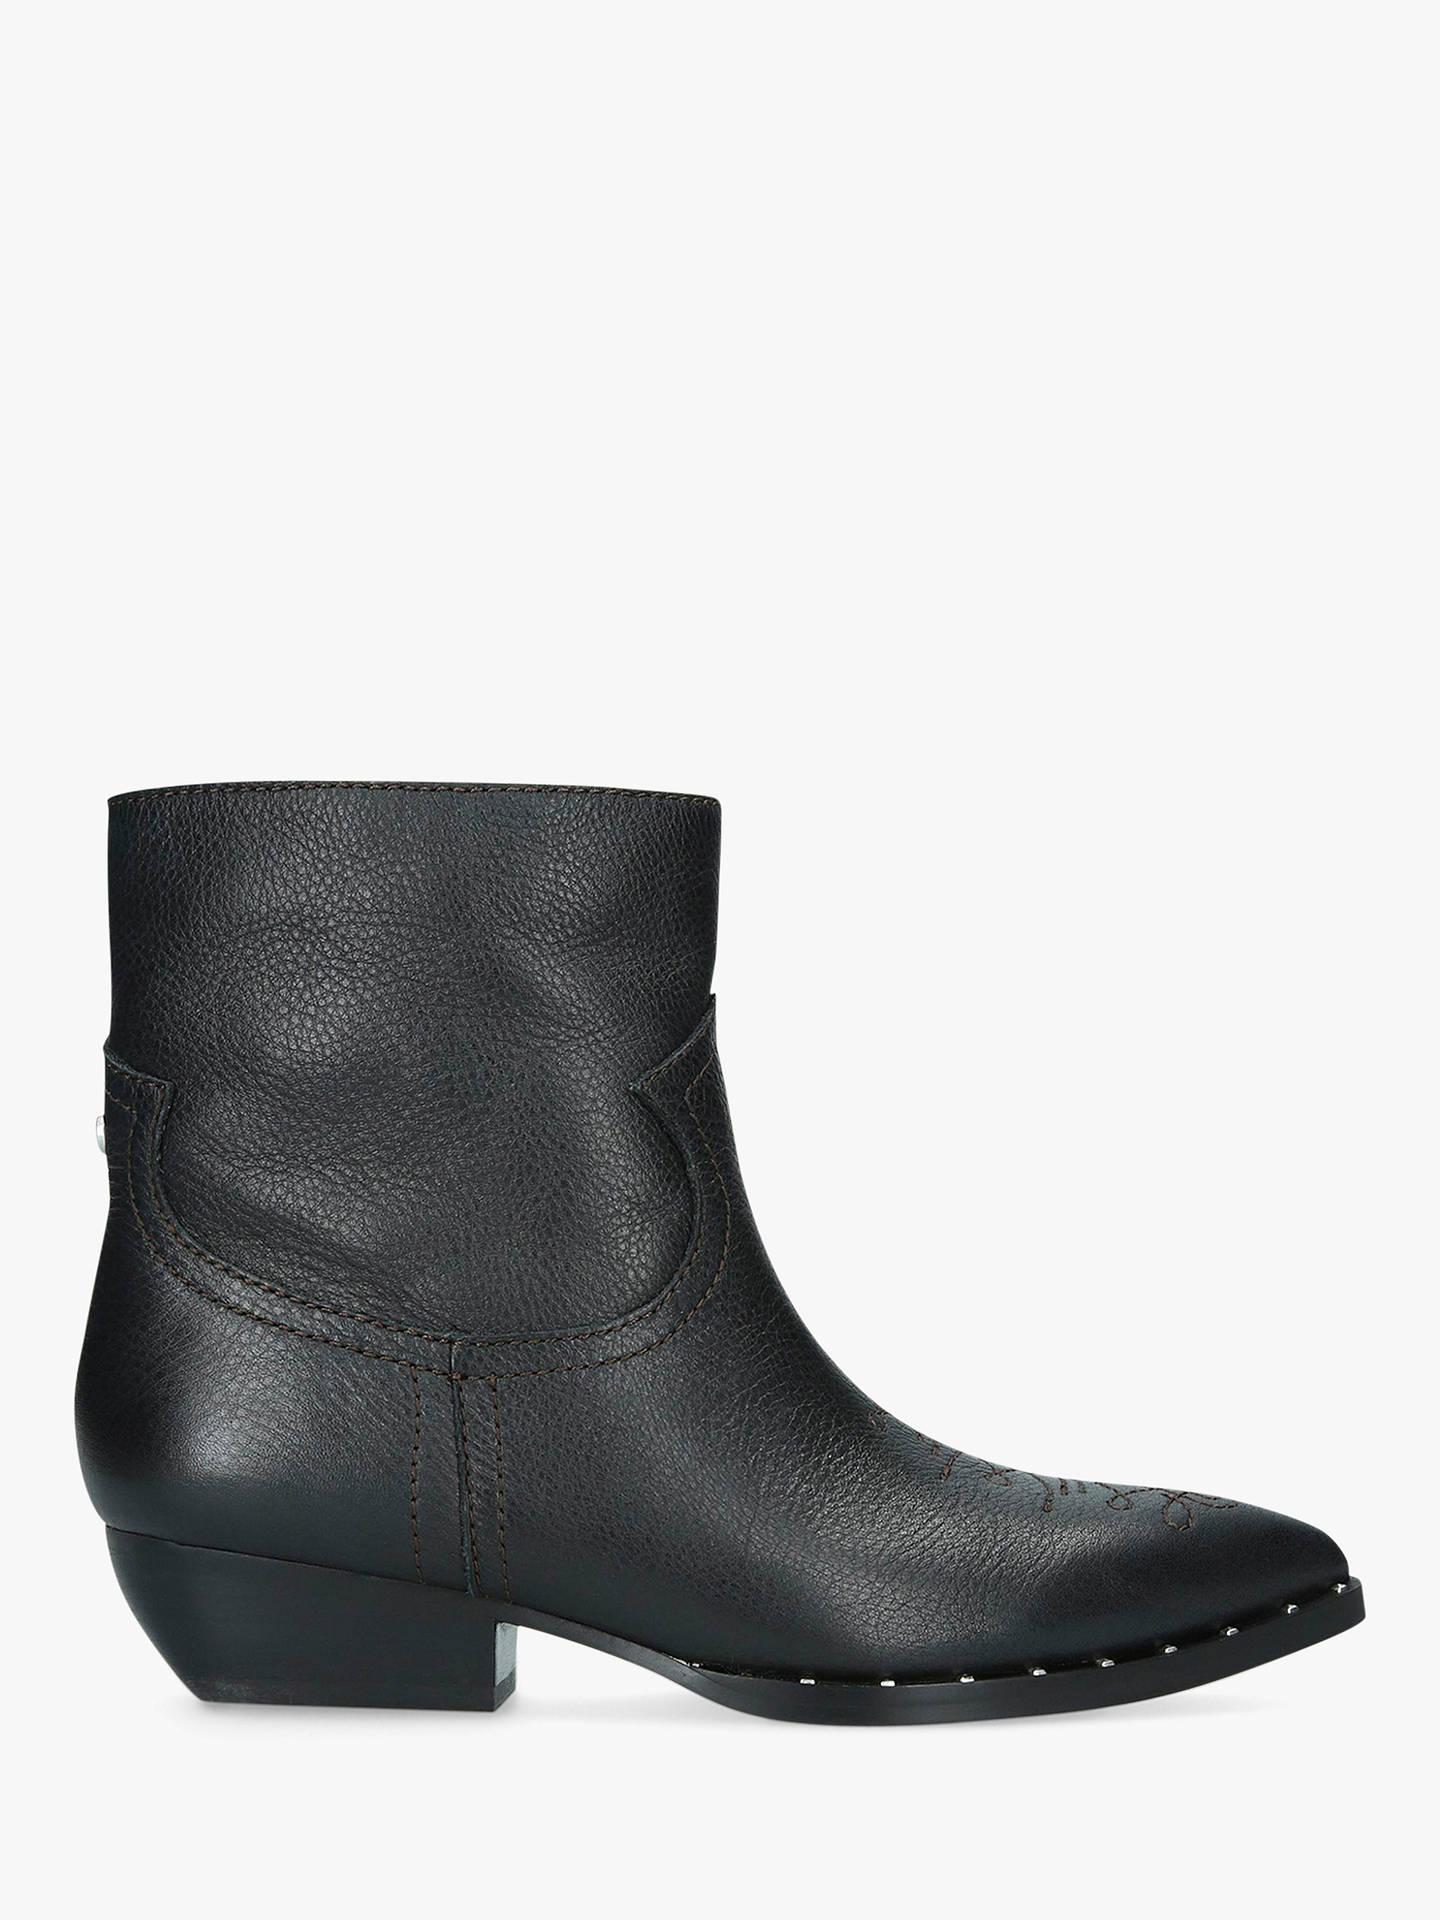 a095b4e360af Buy Sam Edelman Ava Ankle Boots